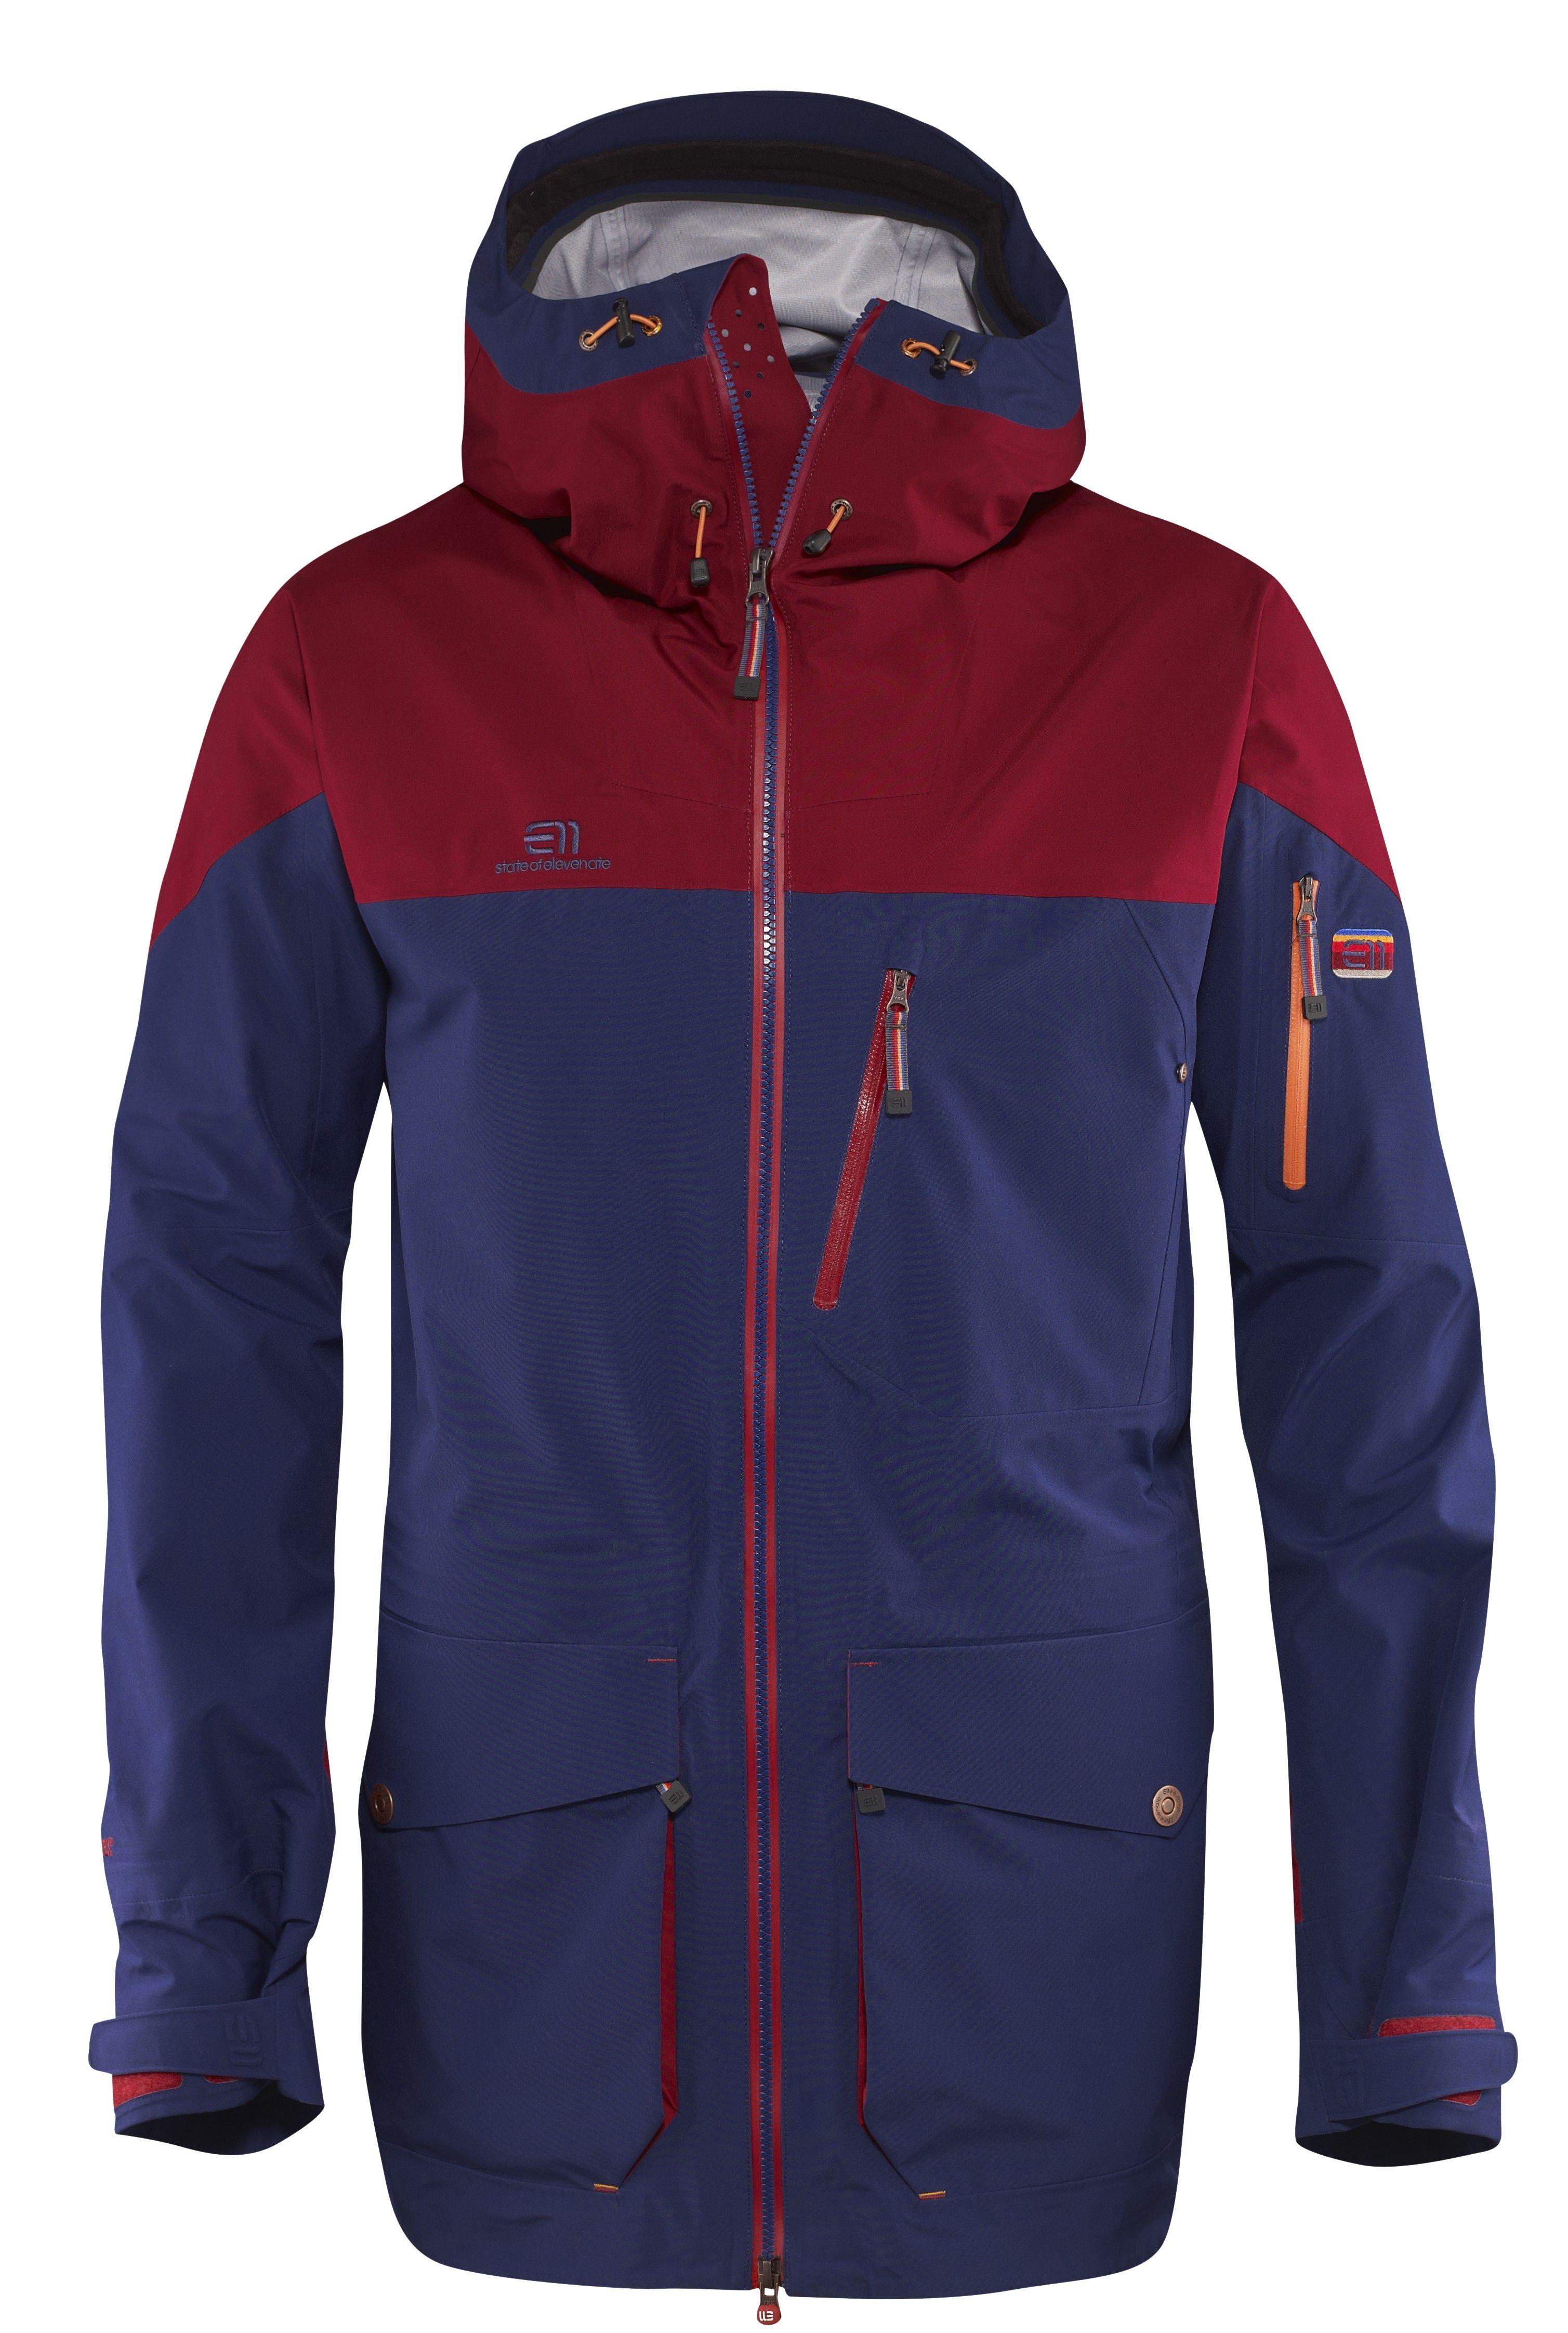 21e51319 Elevenate M Backside Jacket Blueprint - Skijakker - Jakker - Herre -  Produkter